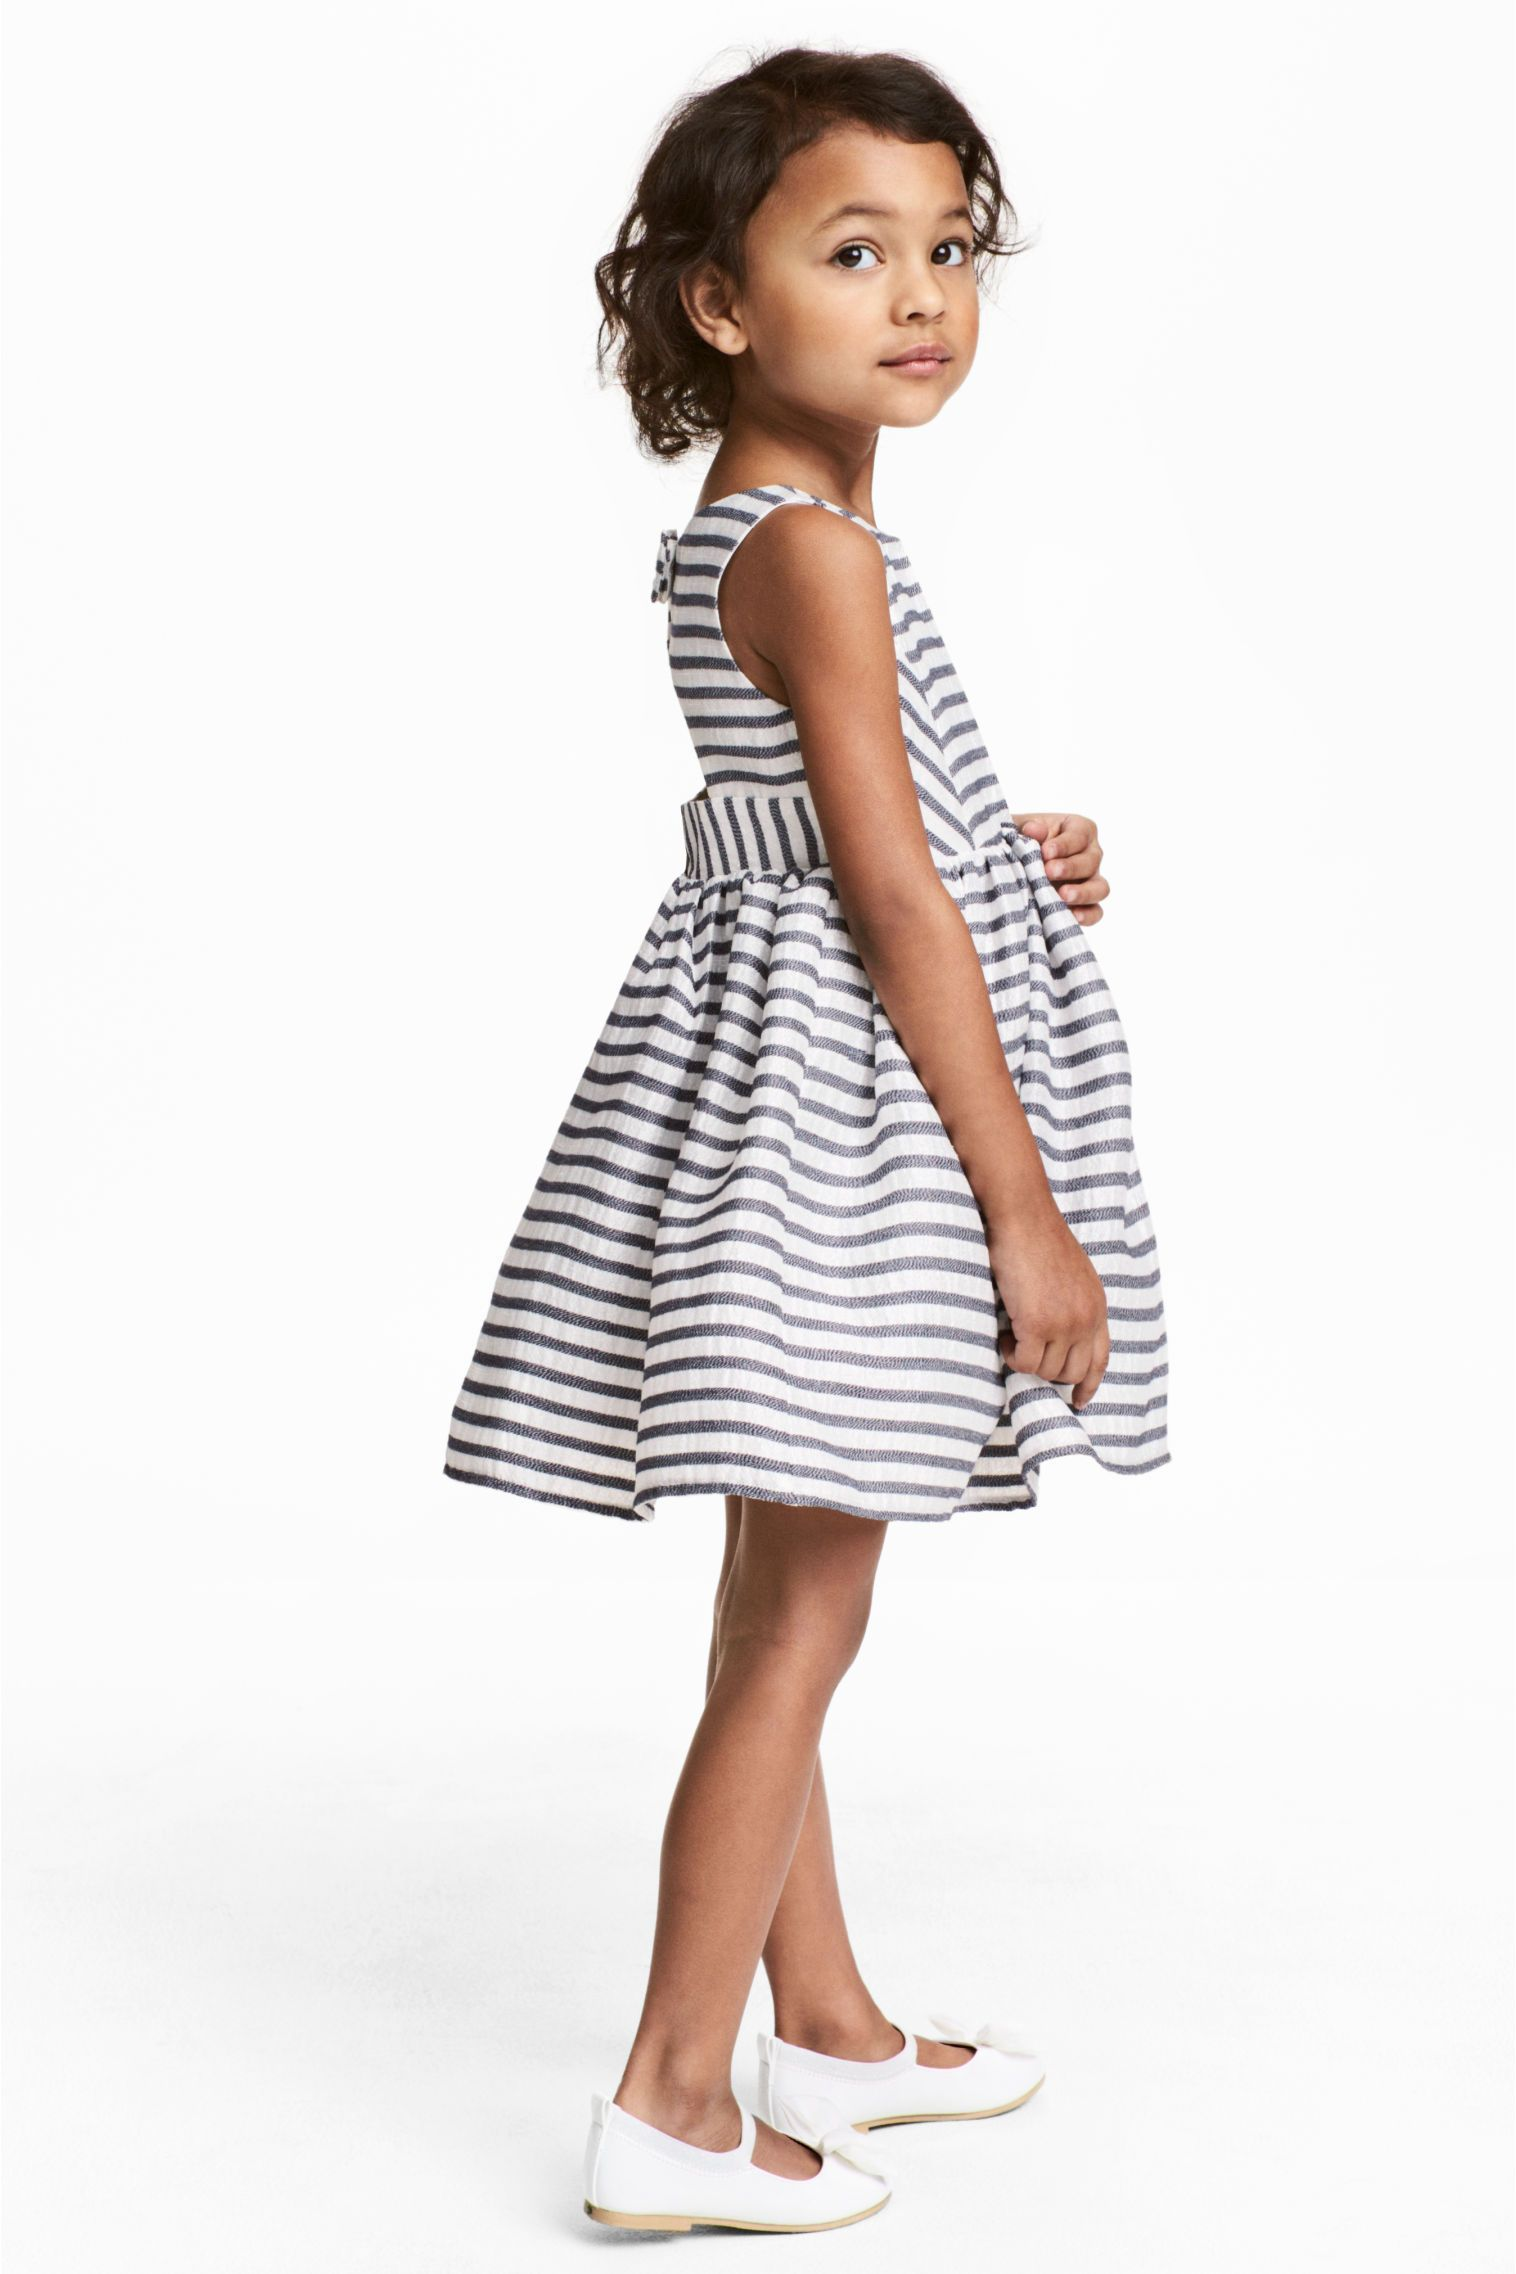 Vestido de rayas | ชุดลายทาง | Pinterest | Vestido de rayas, La ...